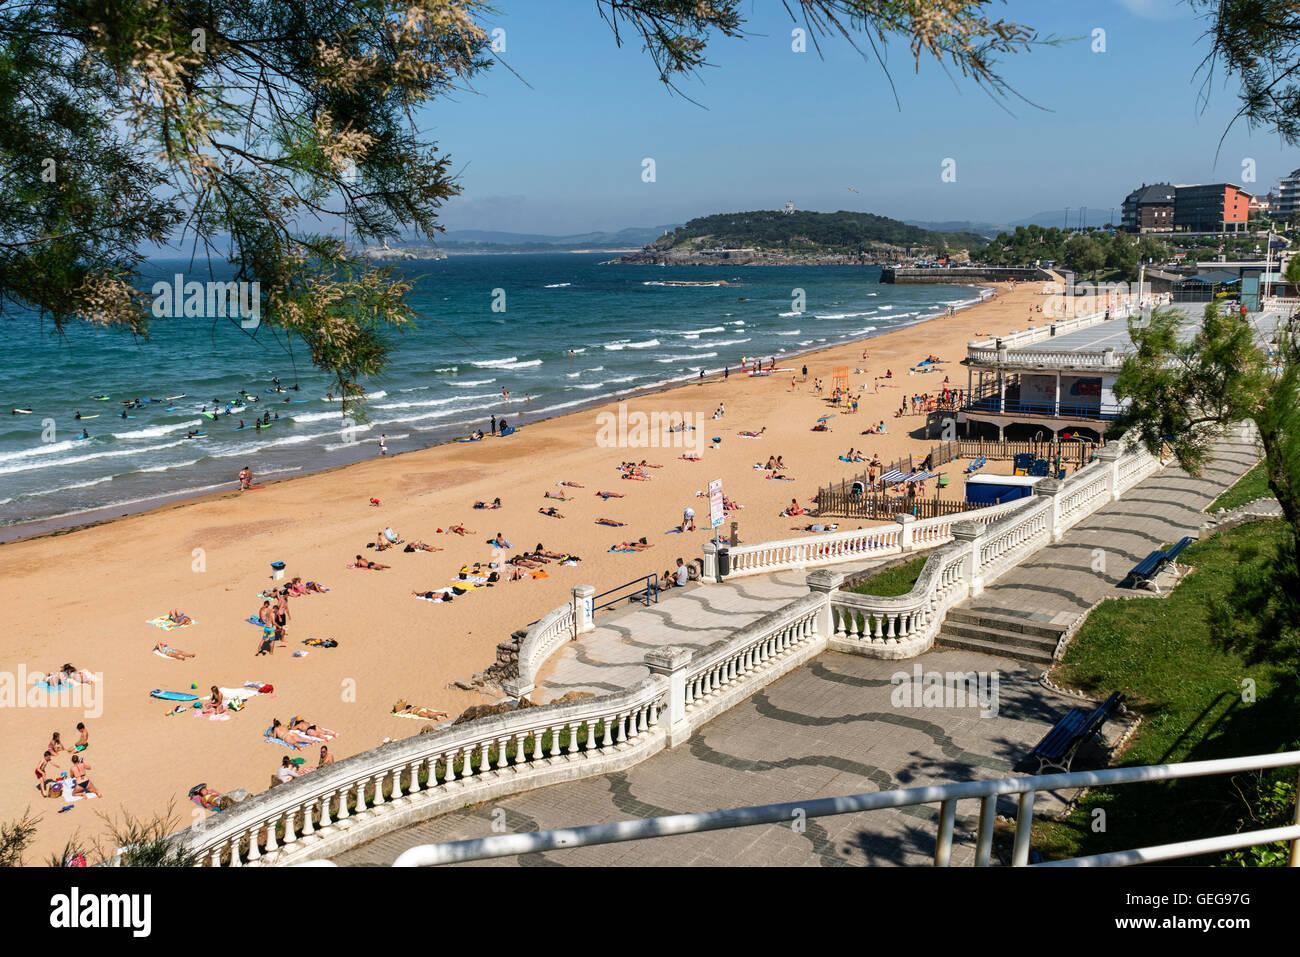 Sardinero Beach Surfer Santander Cantabria Spain Stock Photo Alamy